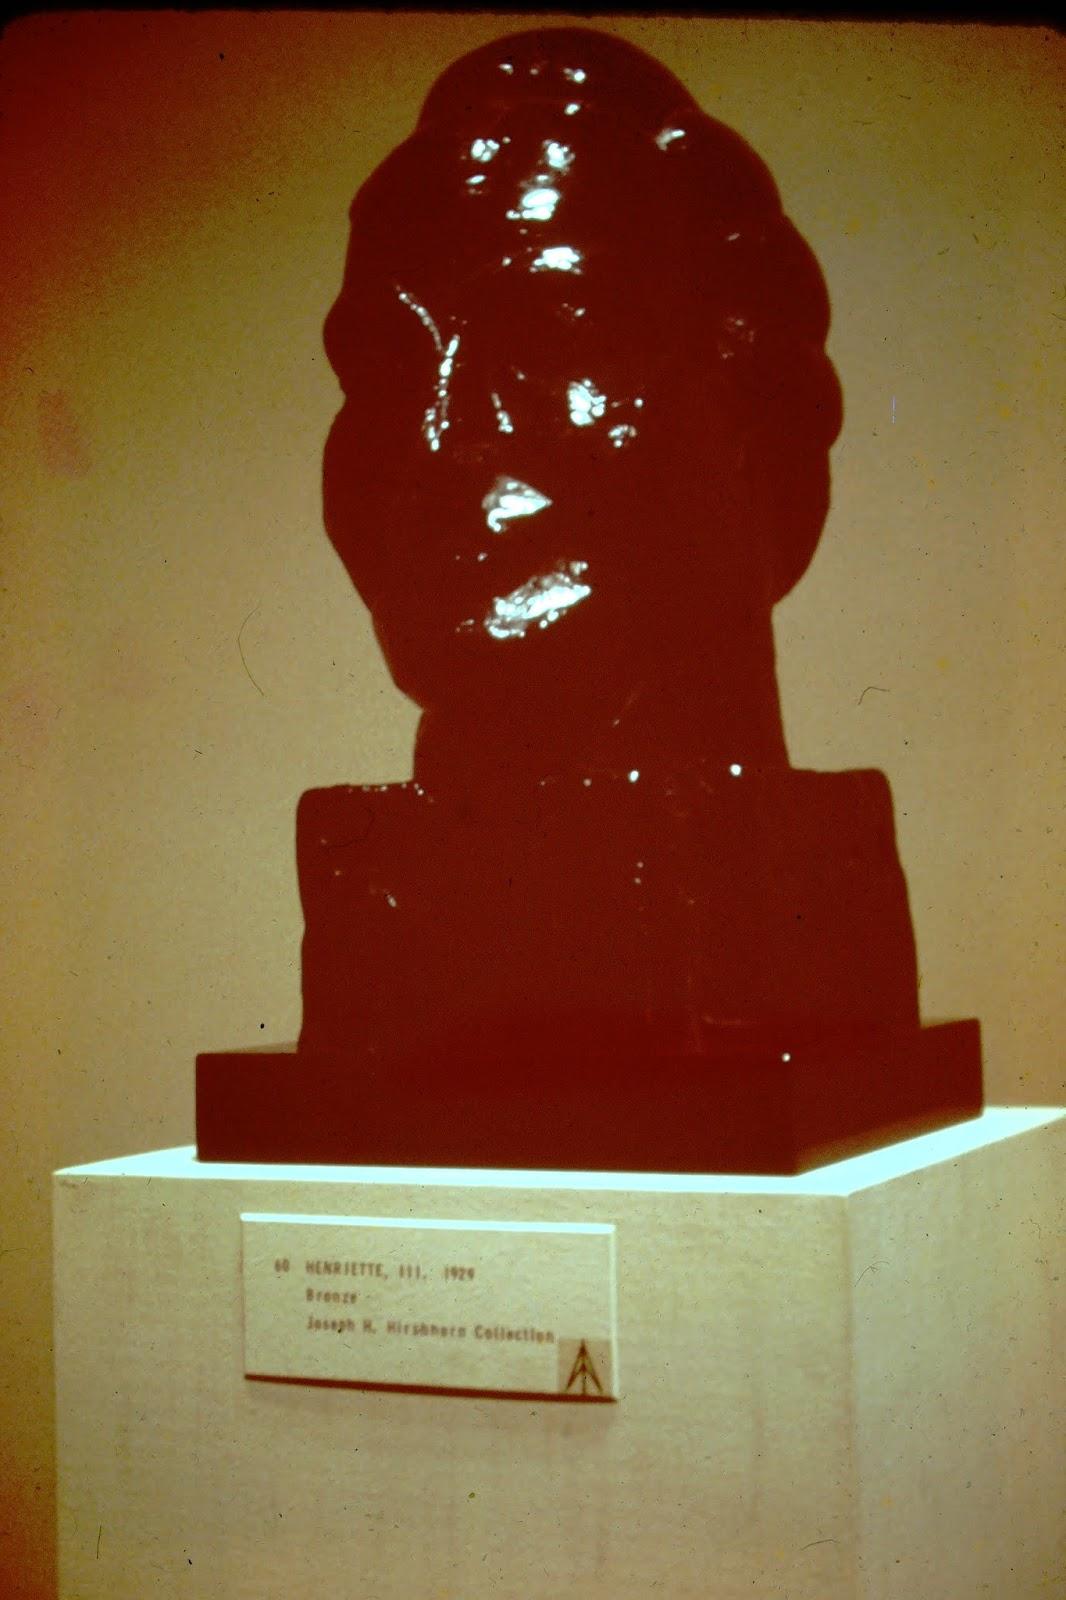 Art, people, Sculpture